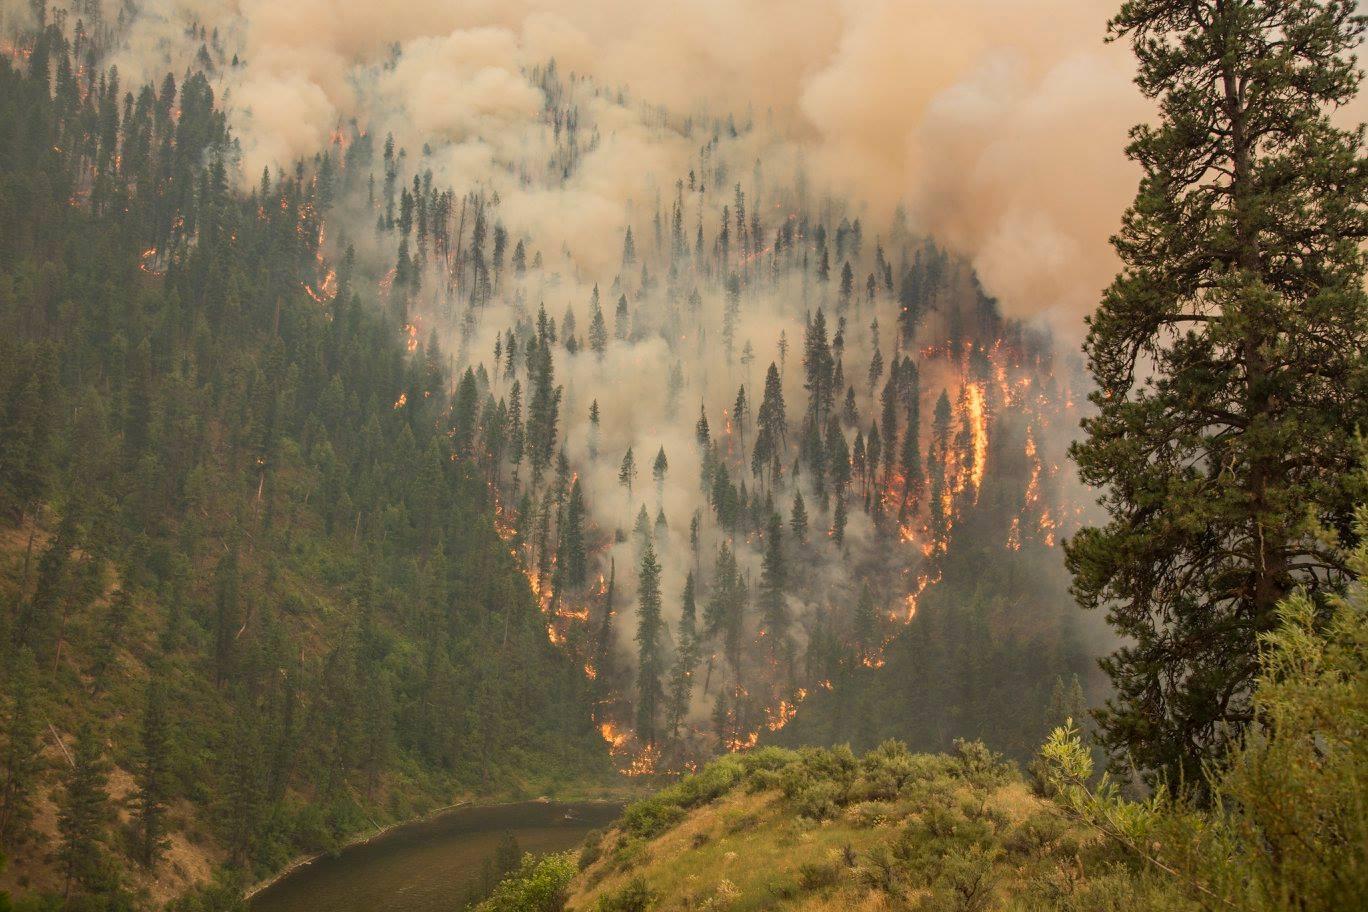 Photo Courtesy of http://boisestatepublicradio.org/post/idaho-congressman-reintroduces-bill-end-forest-service-policy-fire-borrowing